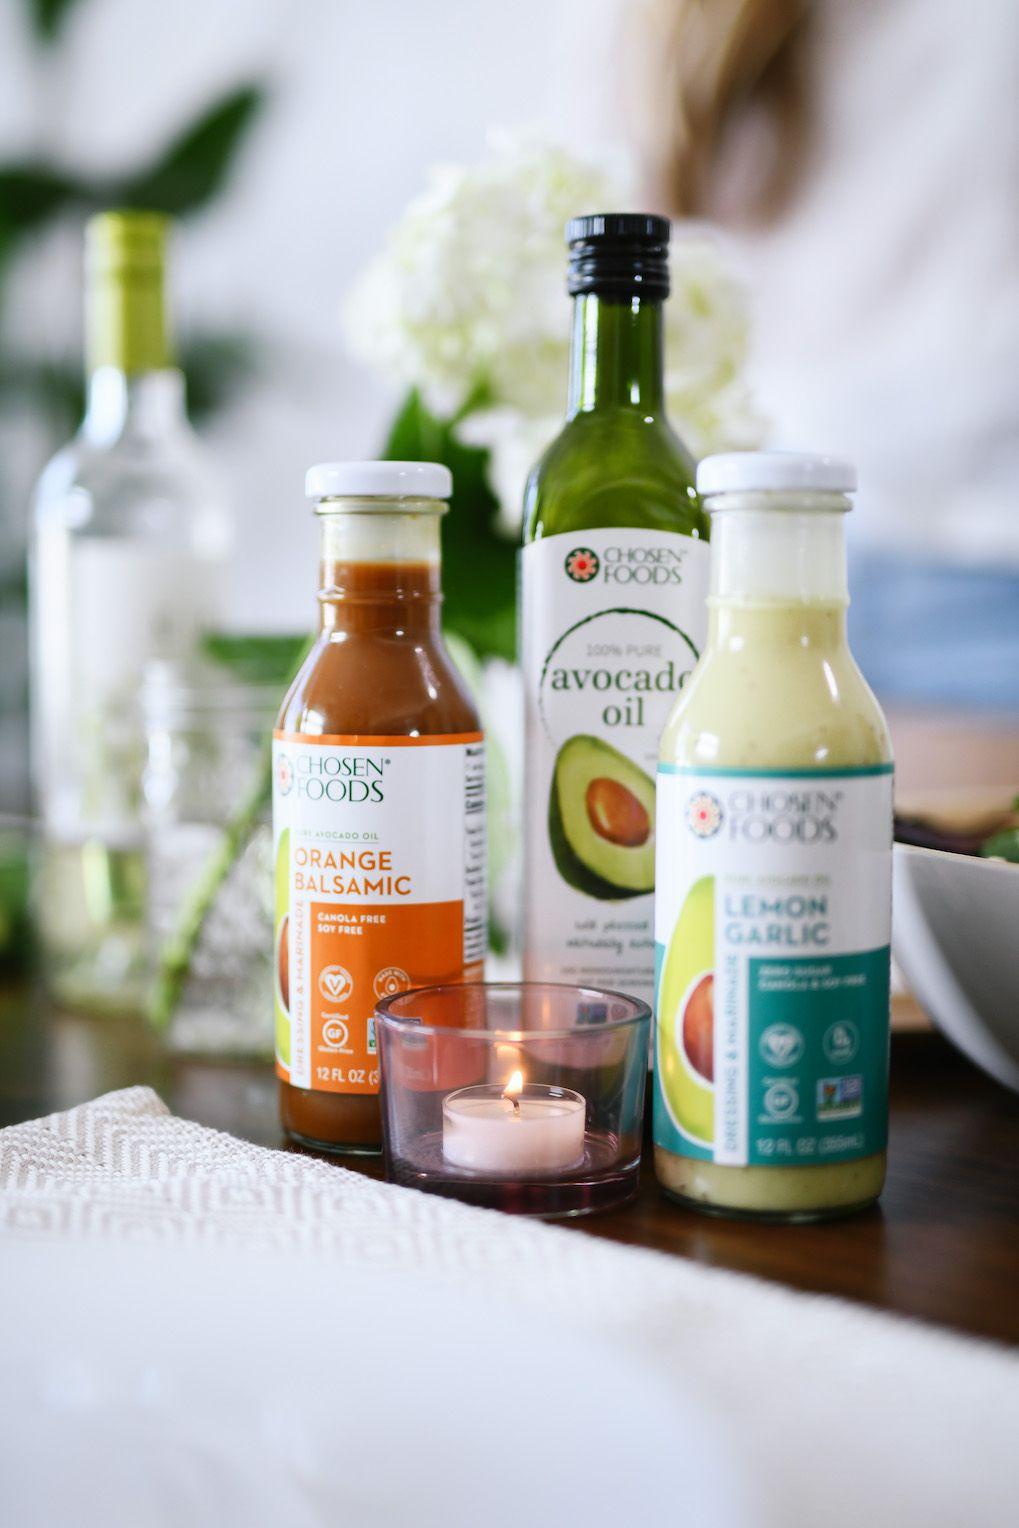 Chosen Foods New Salad Dressings Made With Avocado Oil Chosen Foods Healthy Groceries Avocado